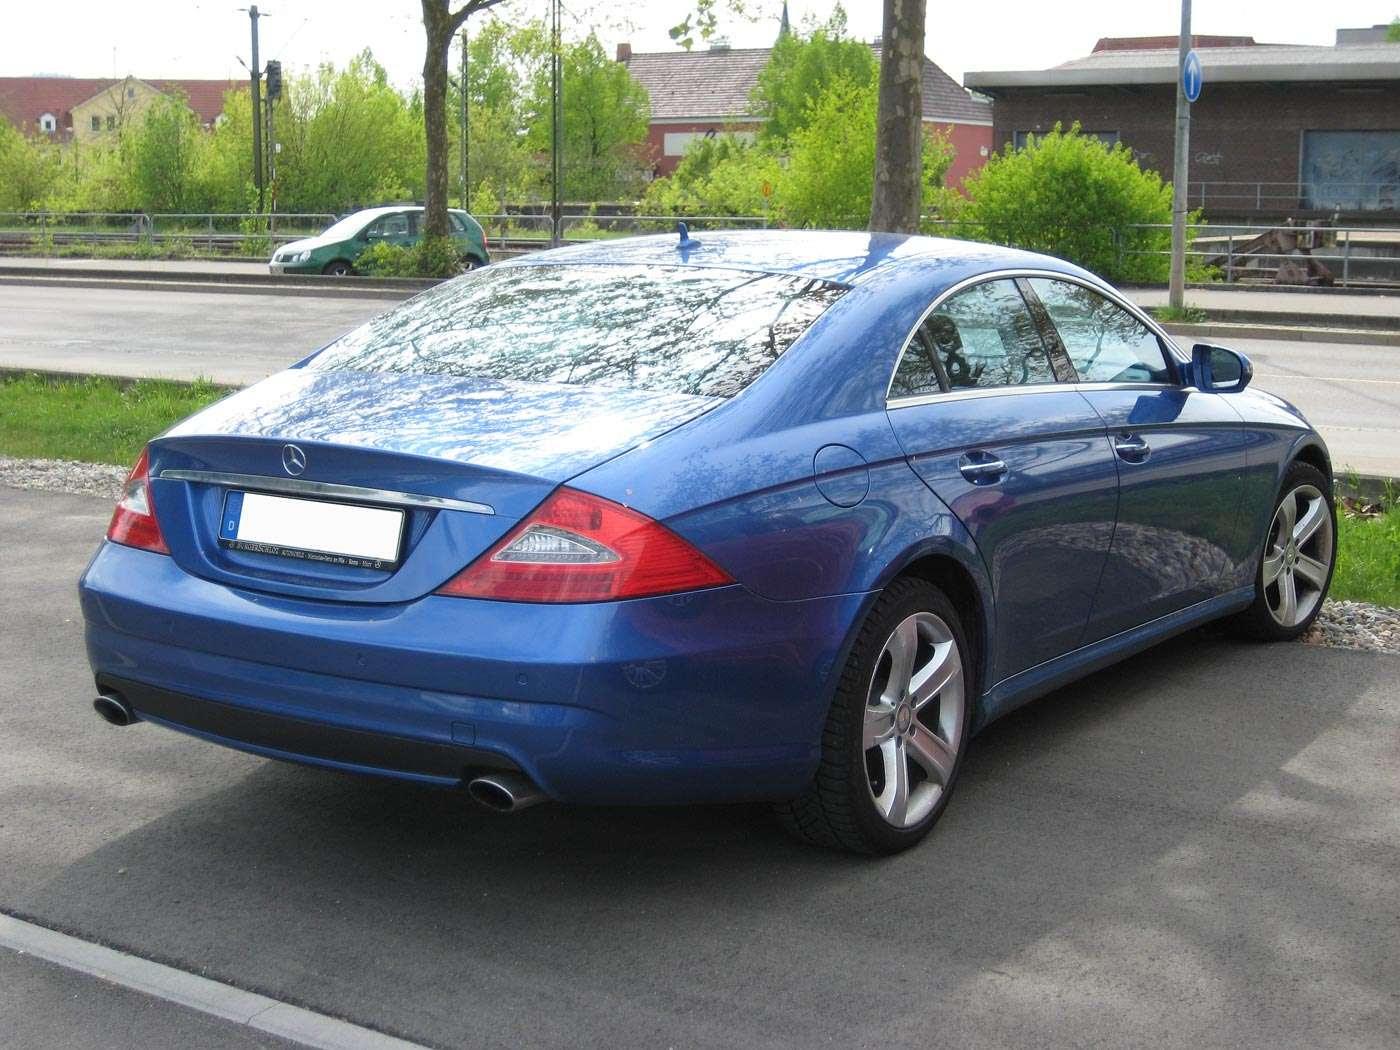 POWER CARS: Mercedes-Benz CLS 500 (designo Mauritius blue)